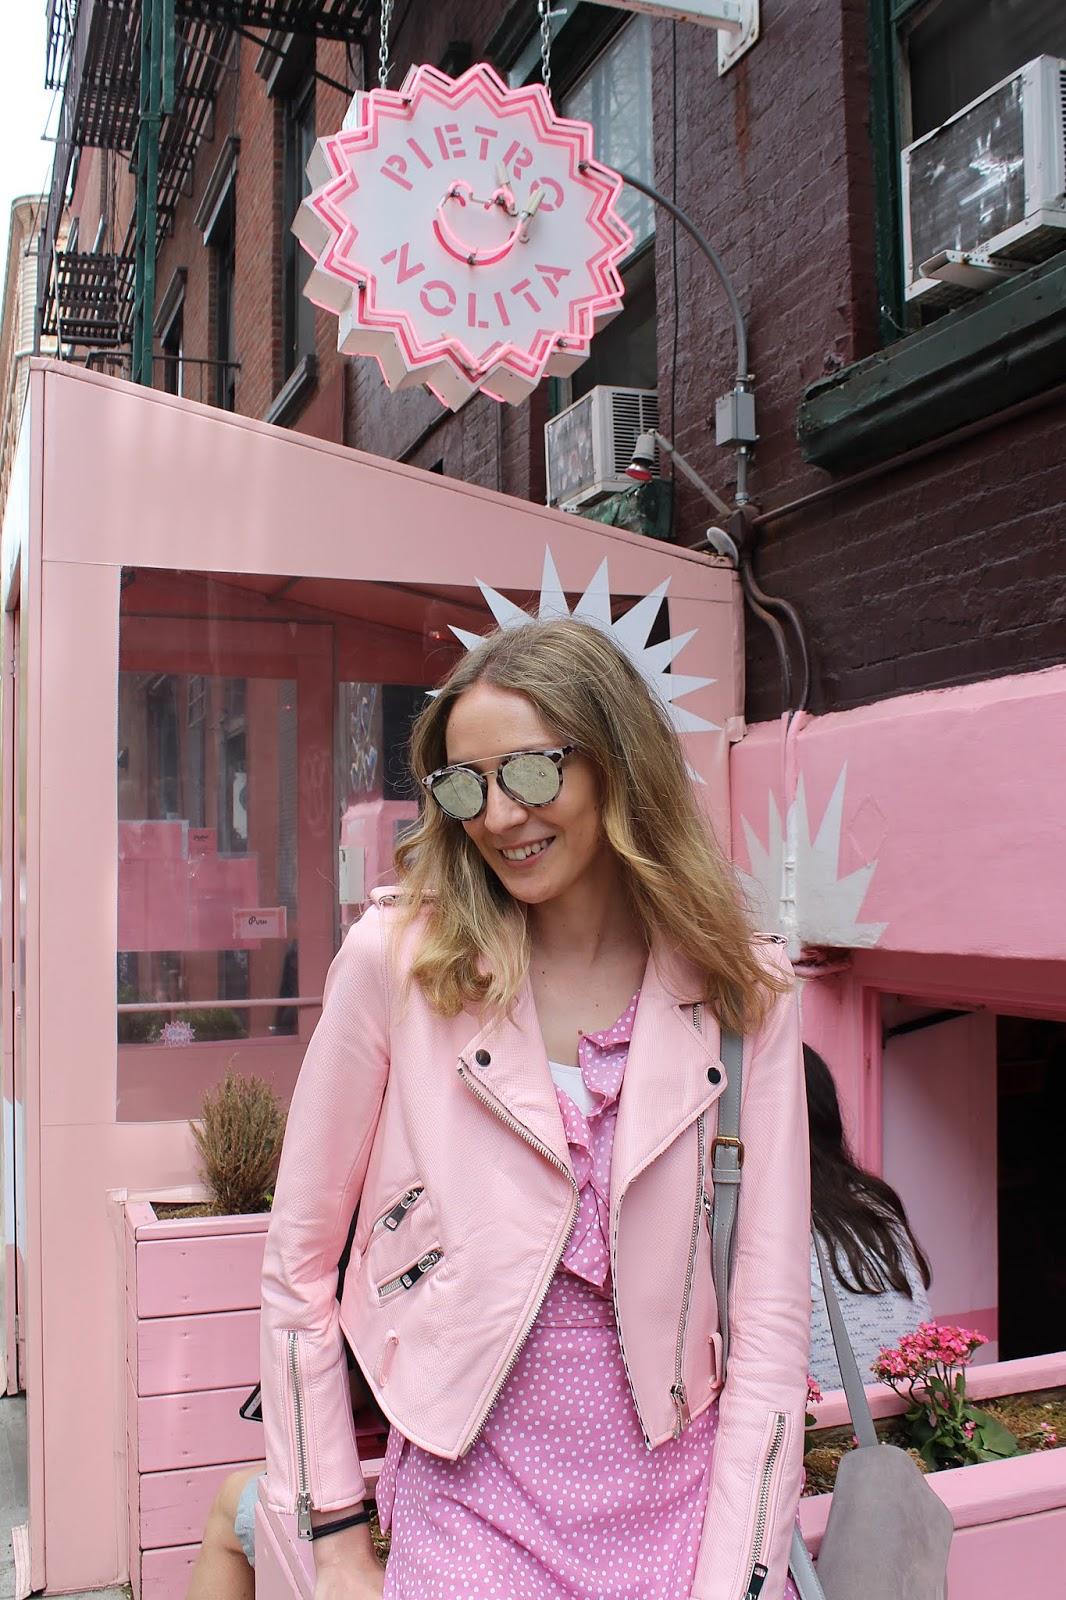 total-pink-look-nakd-dress-polka-dots-wrap-dress-ruffles-barbie-pietro-nolita